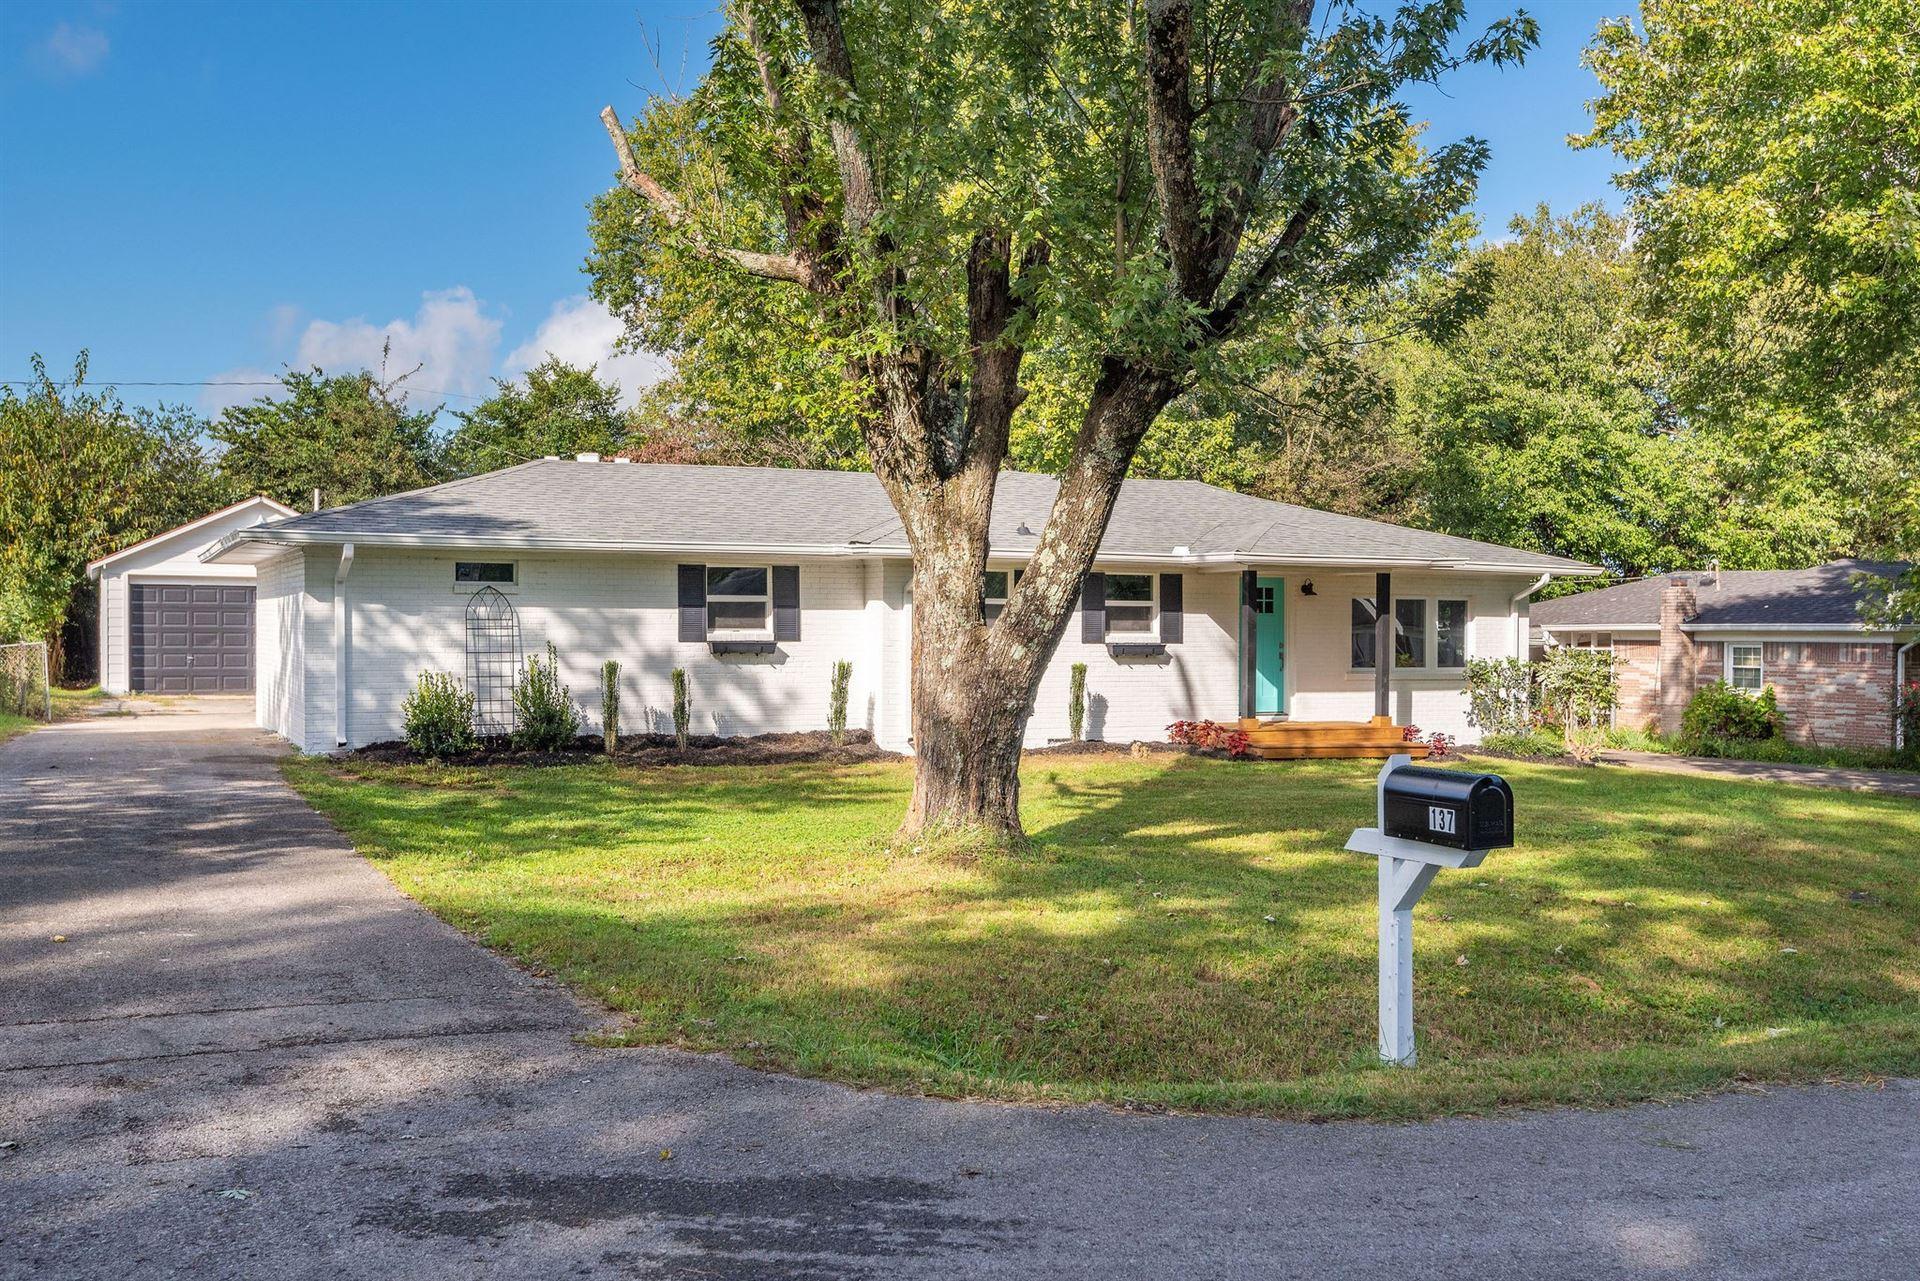 137 McDavid St, Gallatin, TN 37066 - MLS#: 2296497